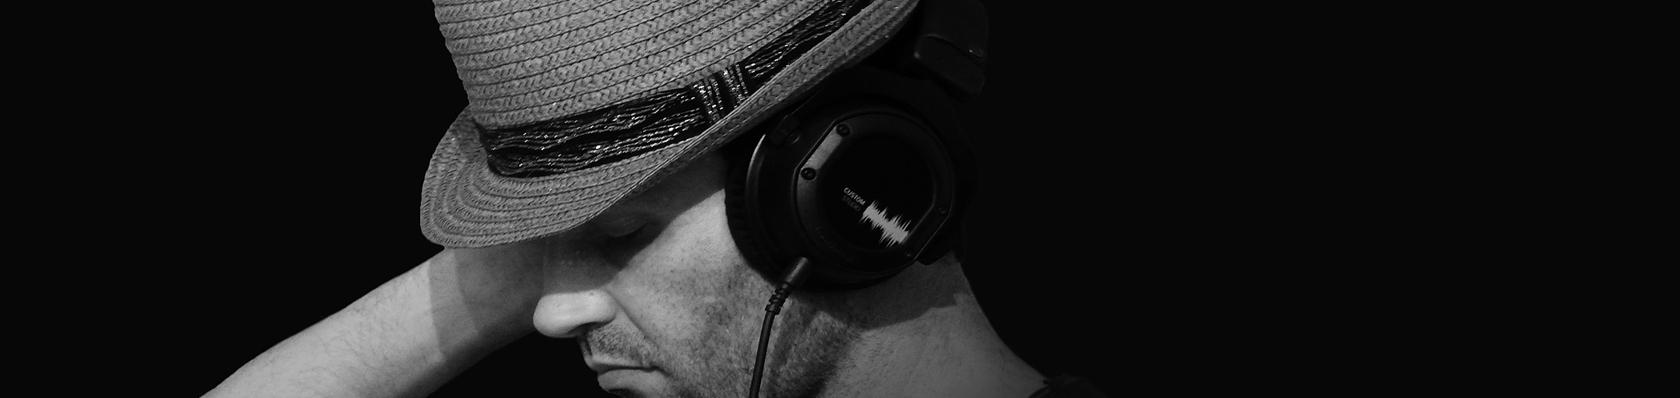 Kopfhörerverstärker im Test auf ExpertenTesten.de